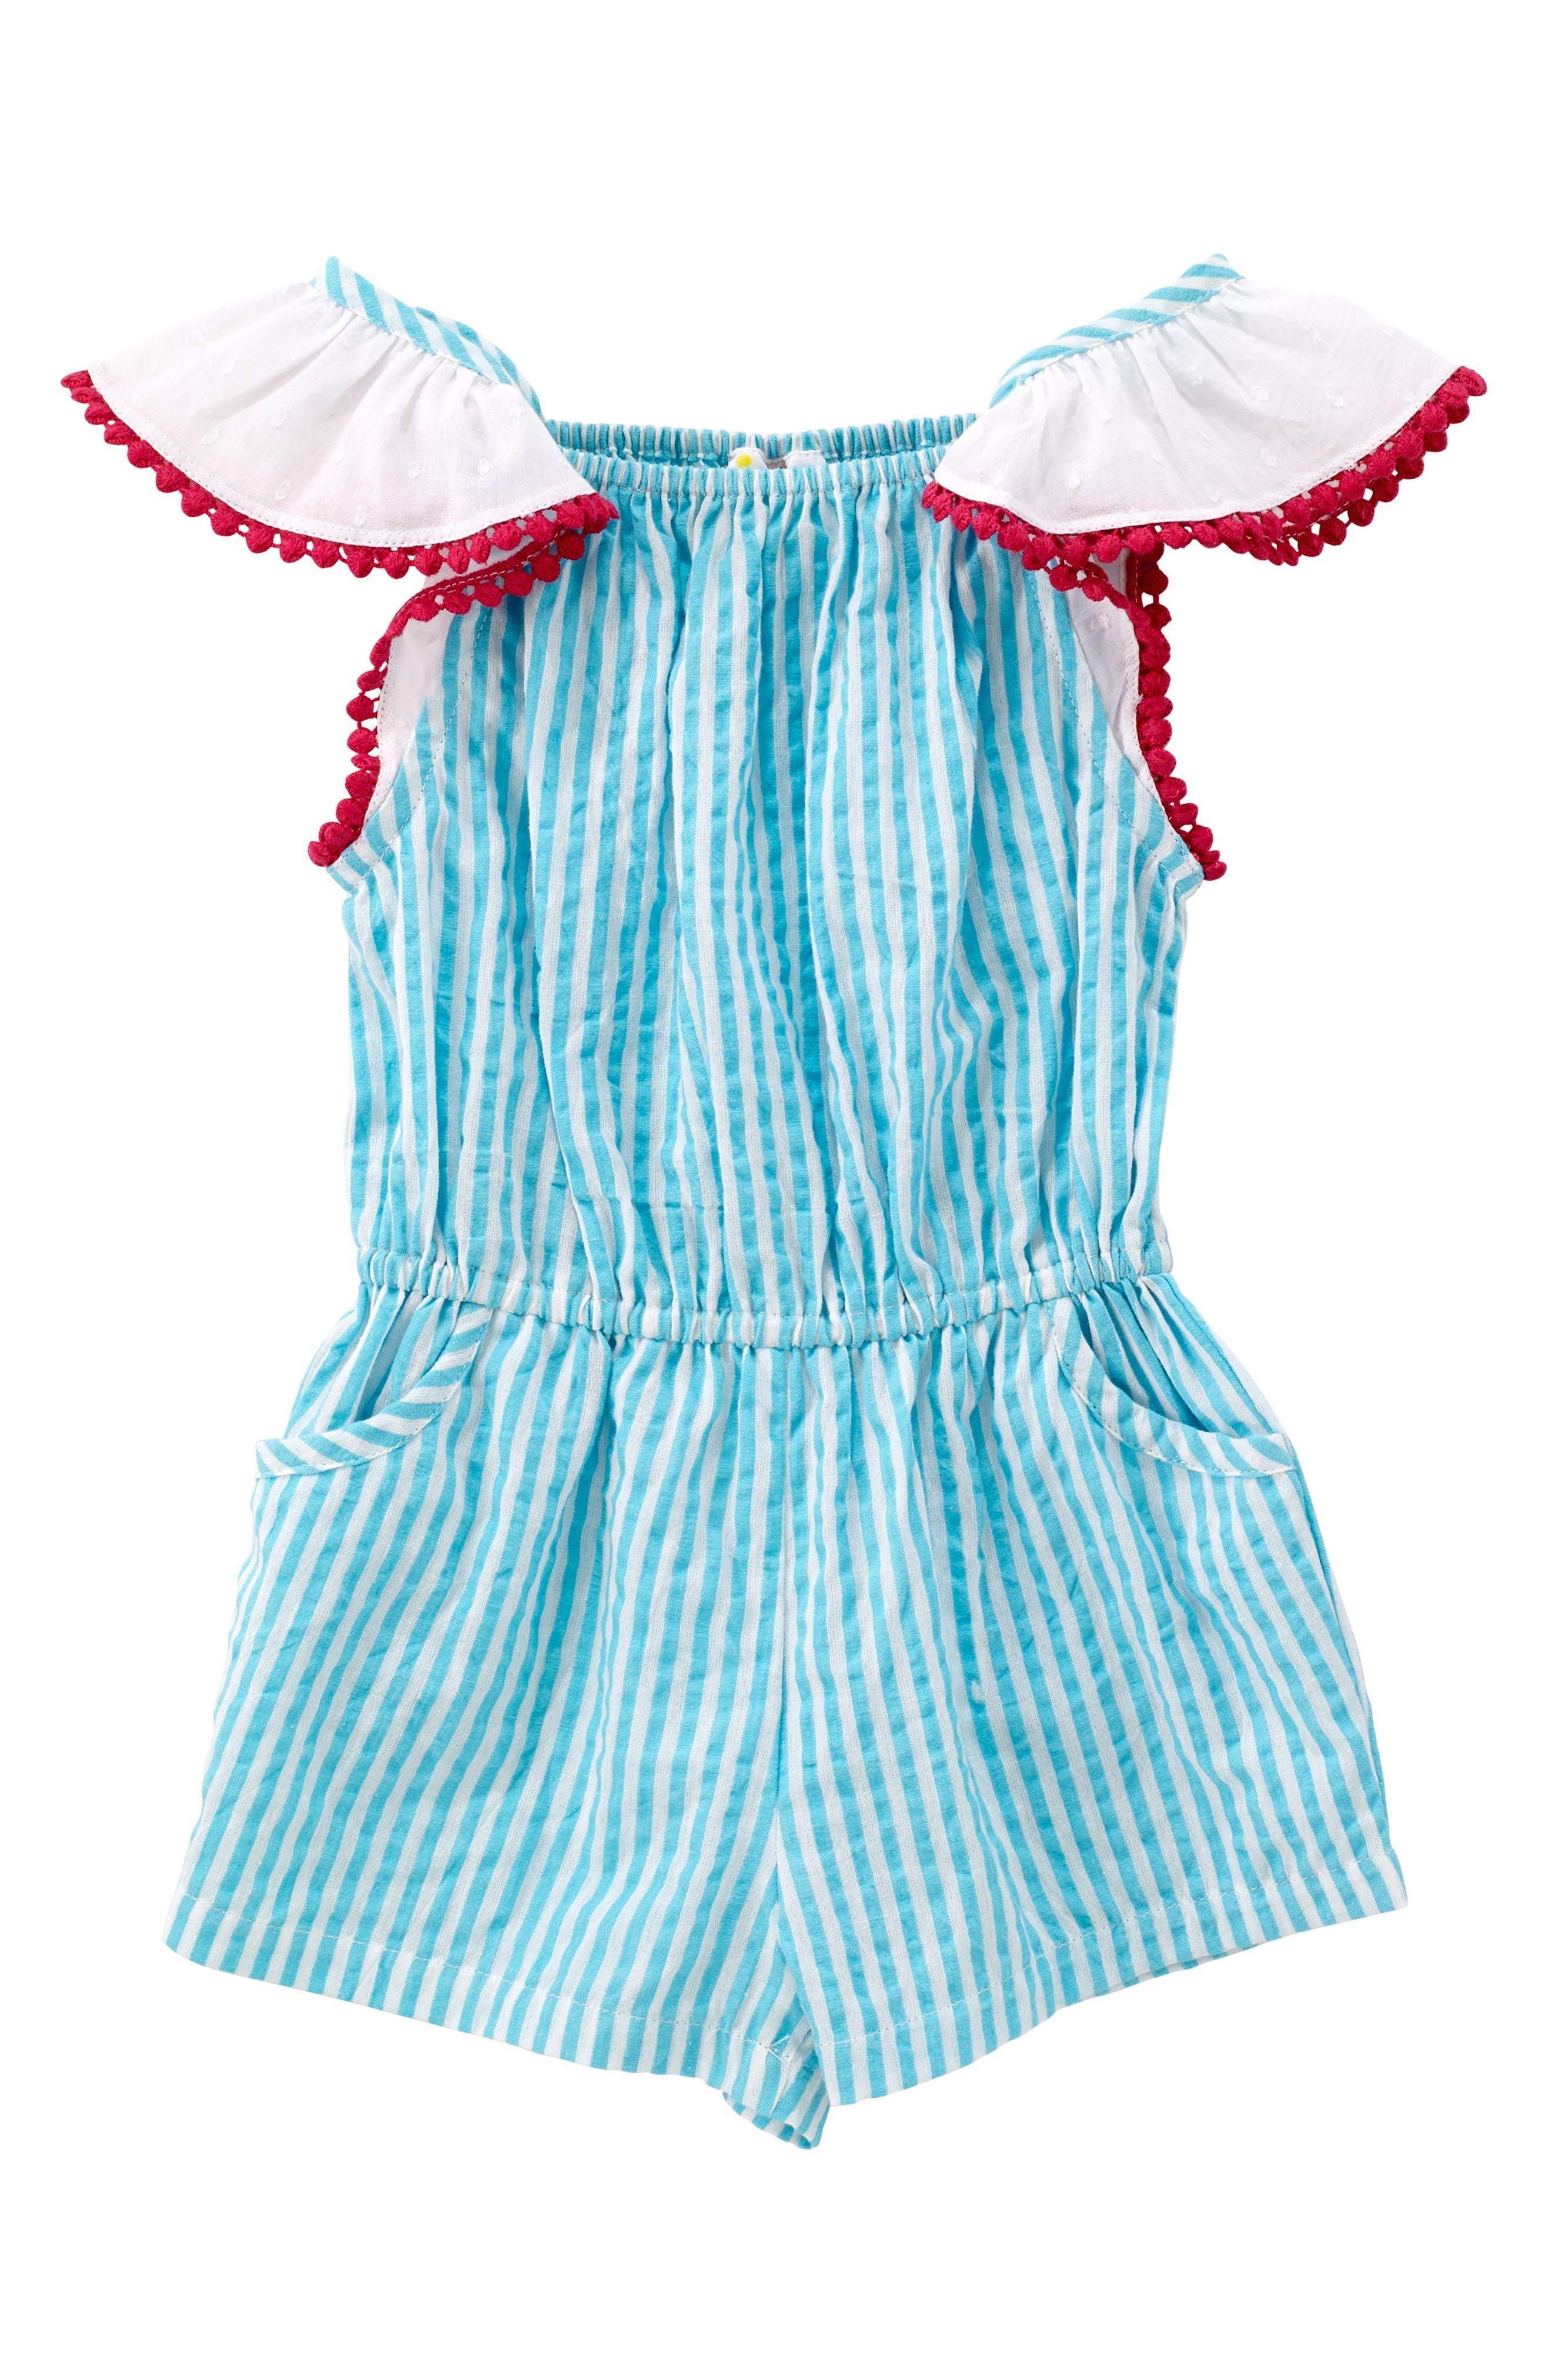 Alternate Image 1 Selected - Masala Baby Zuri Stripe Romper (Toddler Girls, Little Girls & Big Girls)